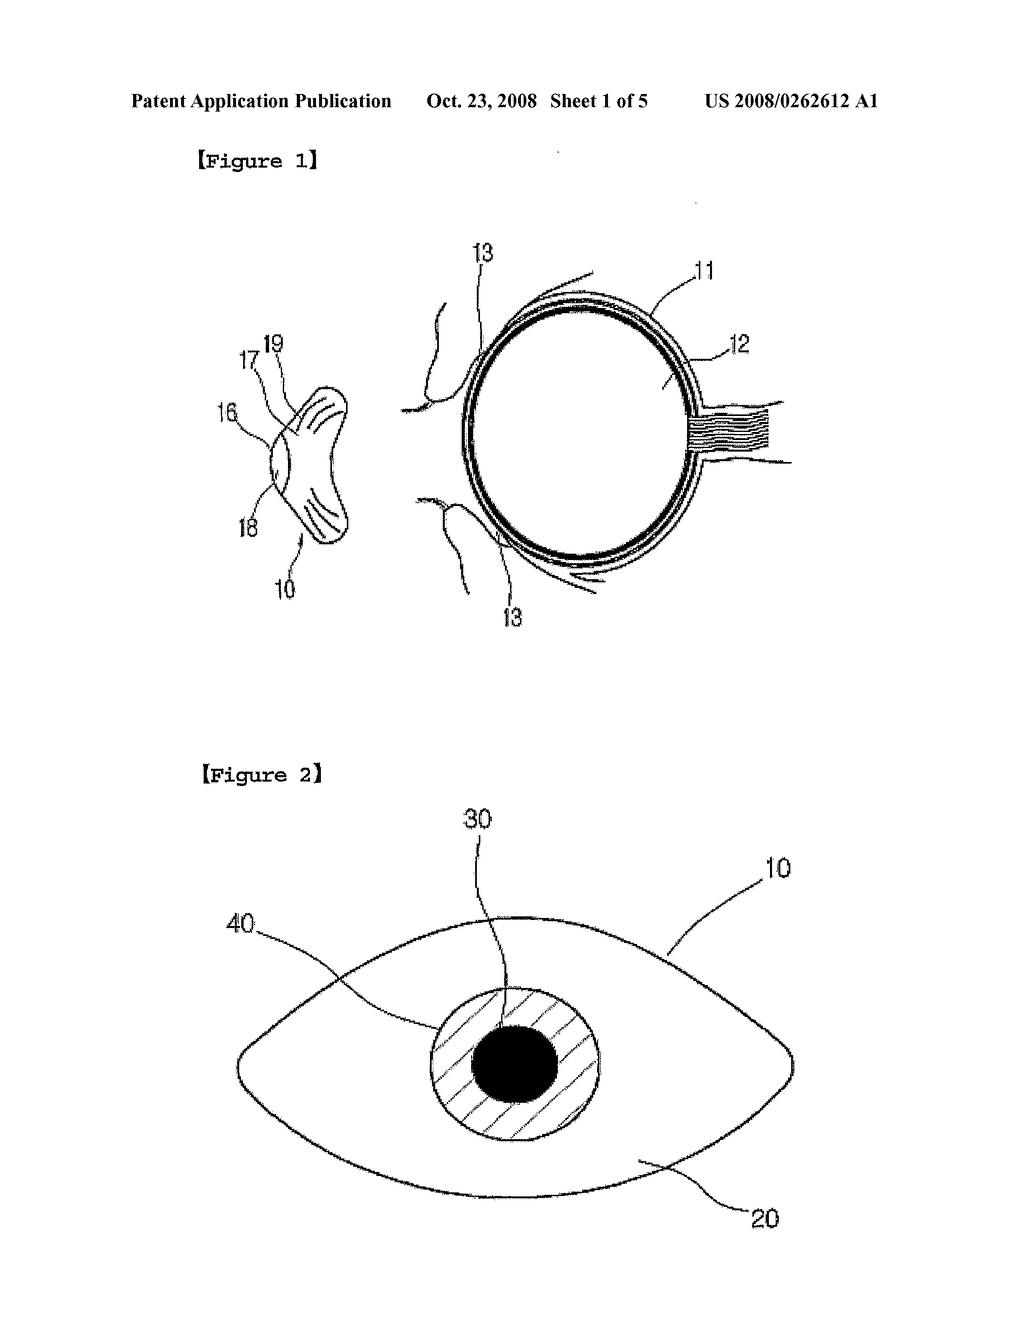 diagram of artificial eye turn signal module harley davidson bio and conformer schematic image 02